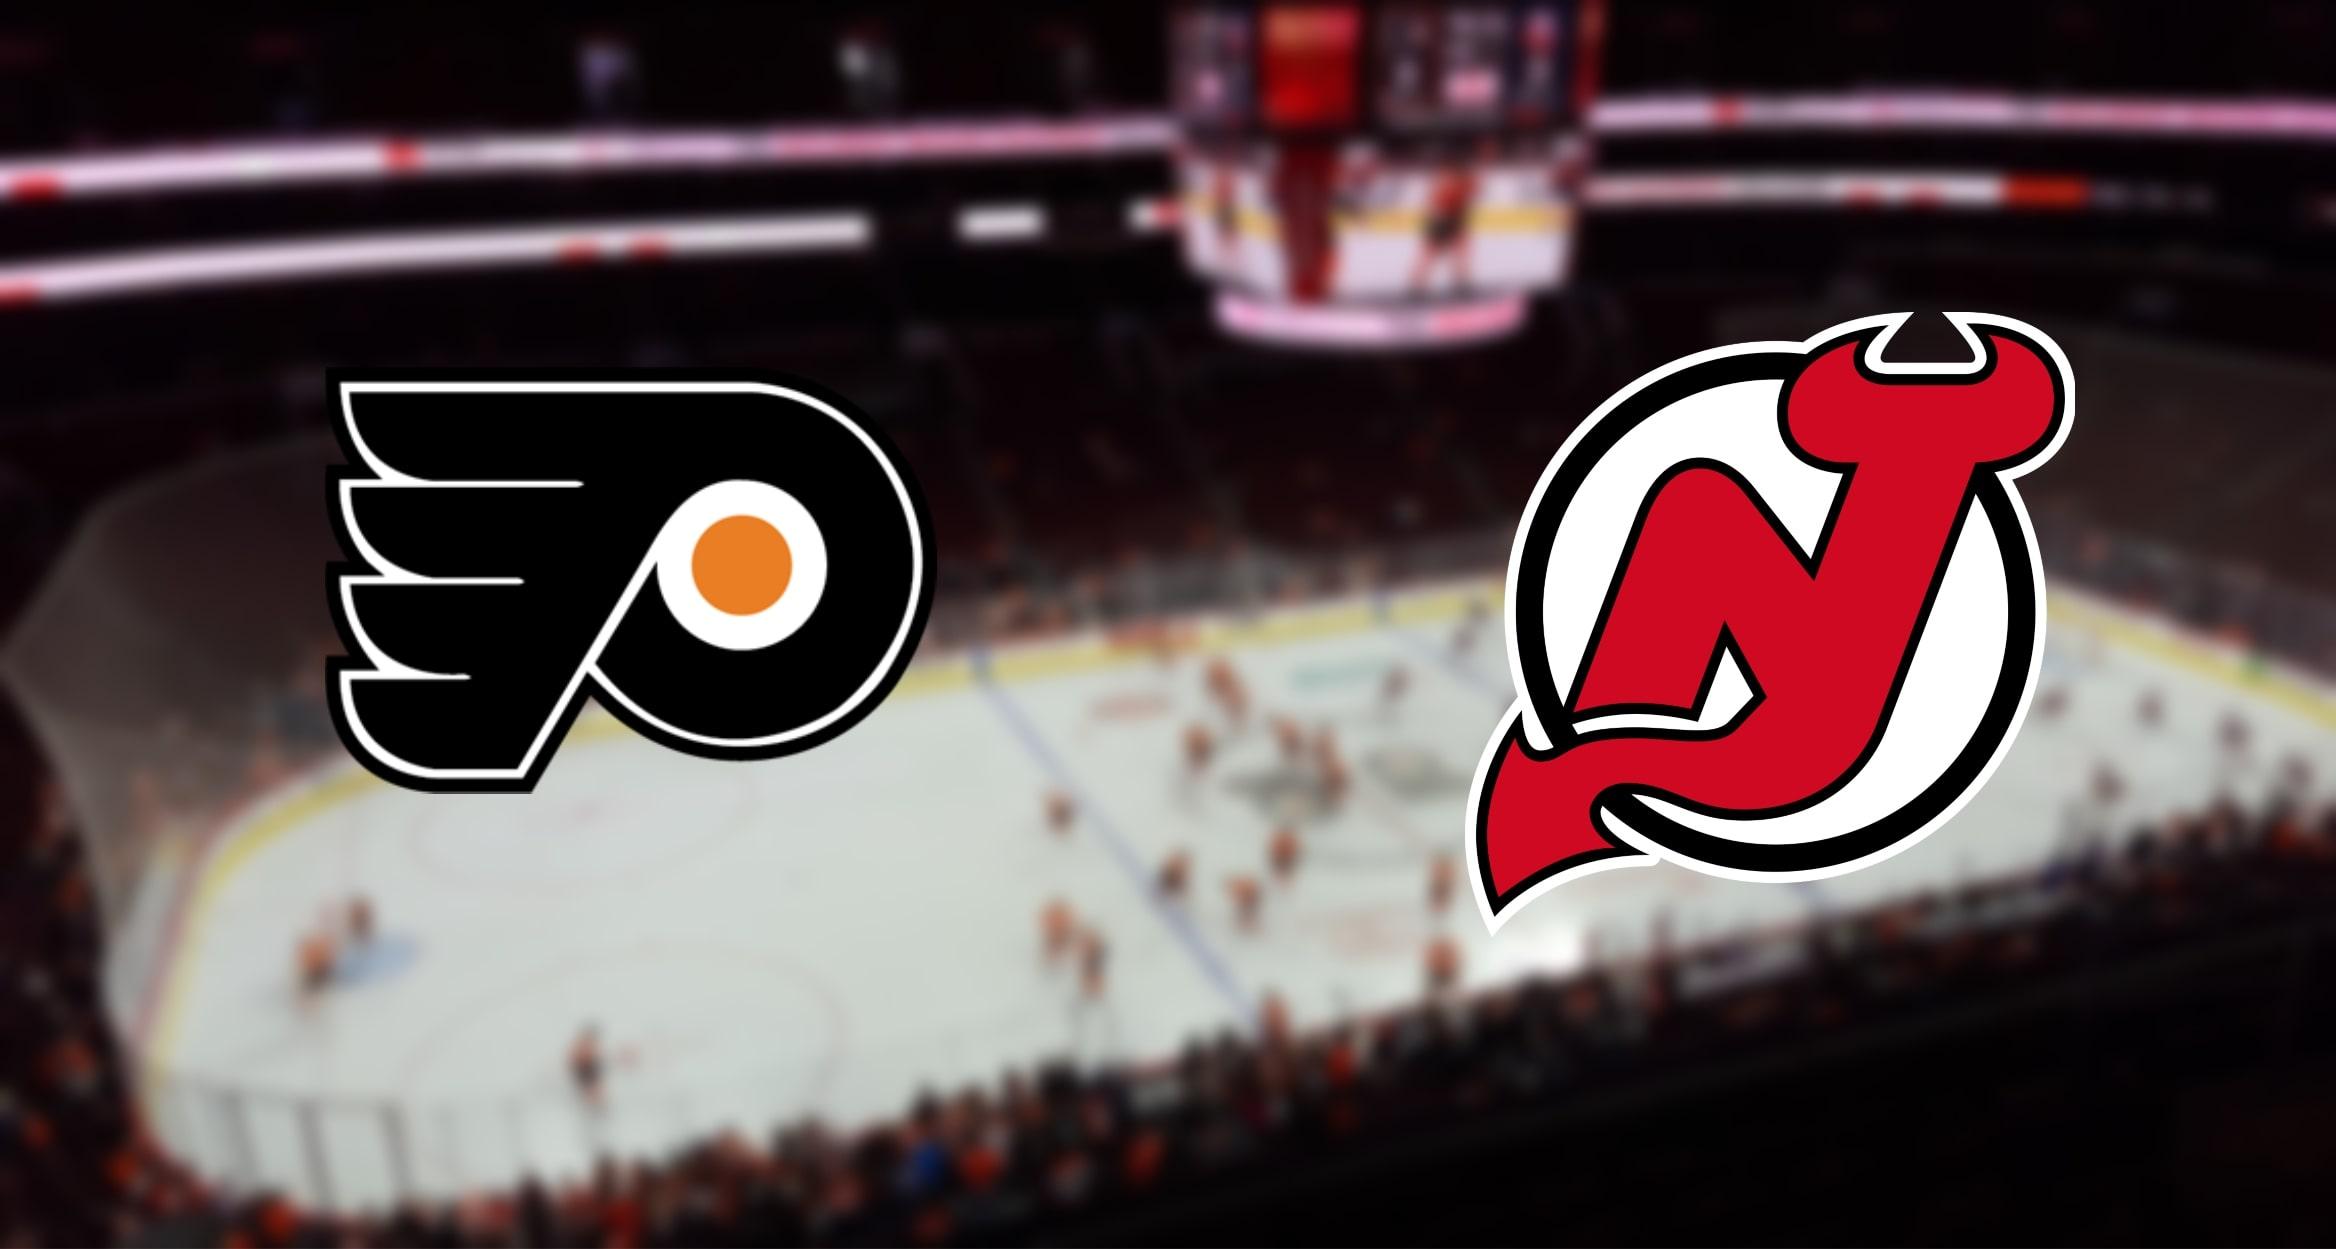 Philadelphia Flyers vs New Jersey Devils Prediction (NHL: 09.10 North America, 10.10 Europe)